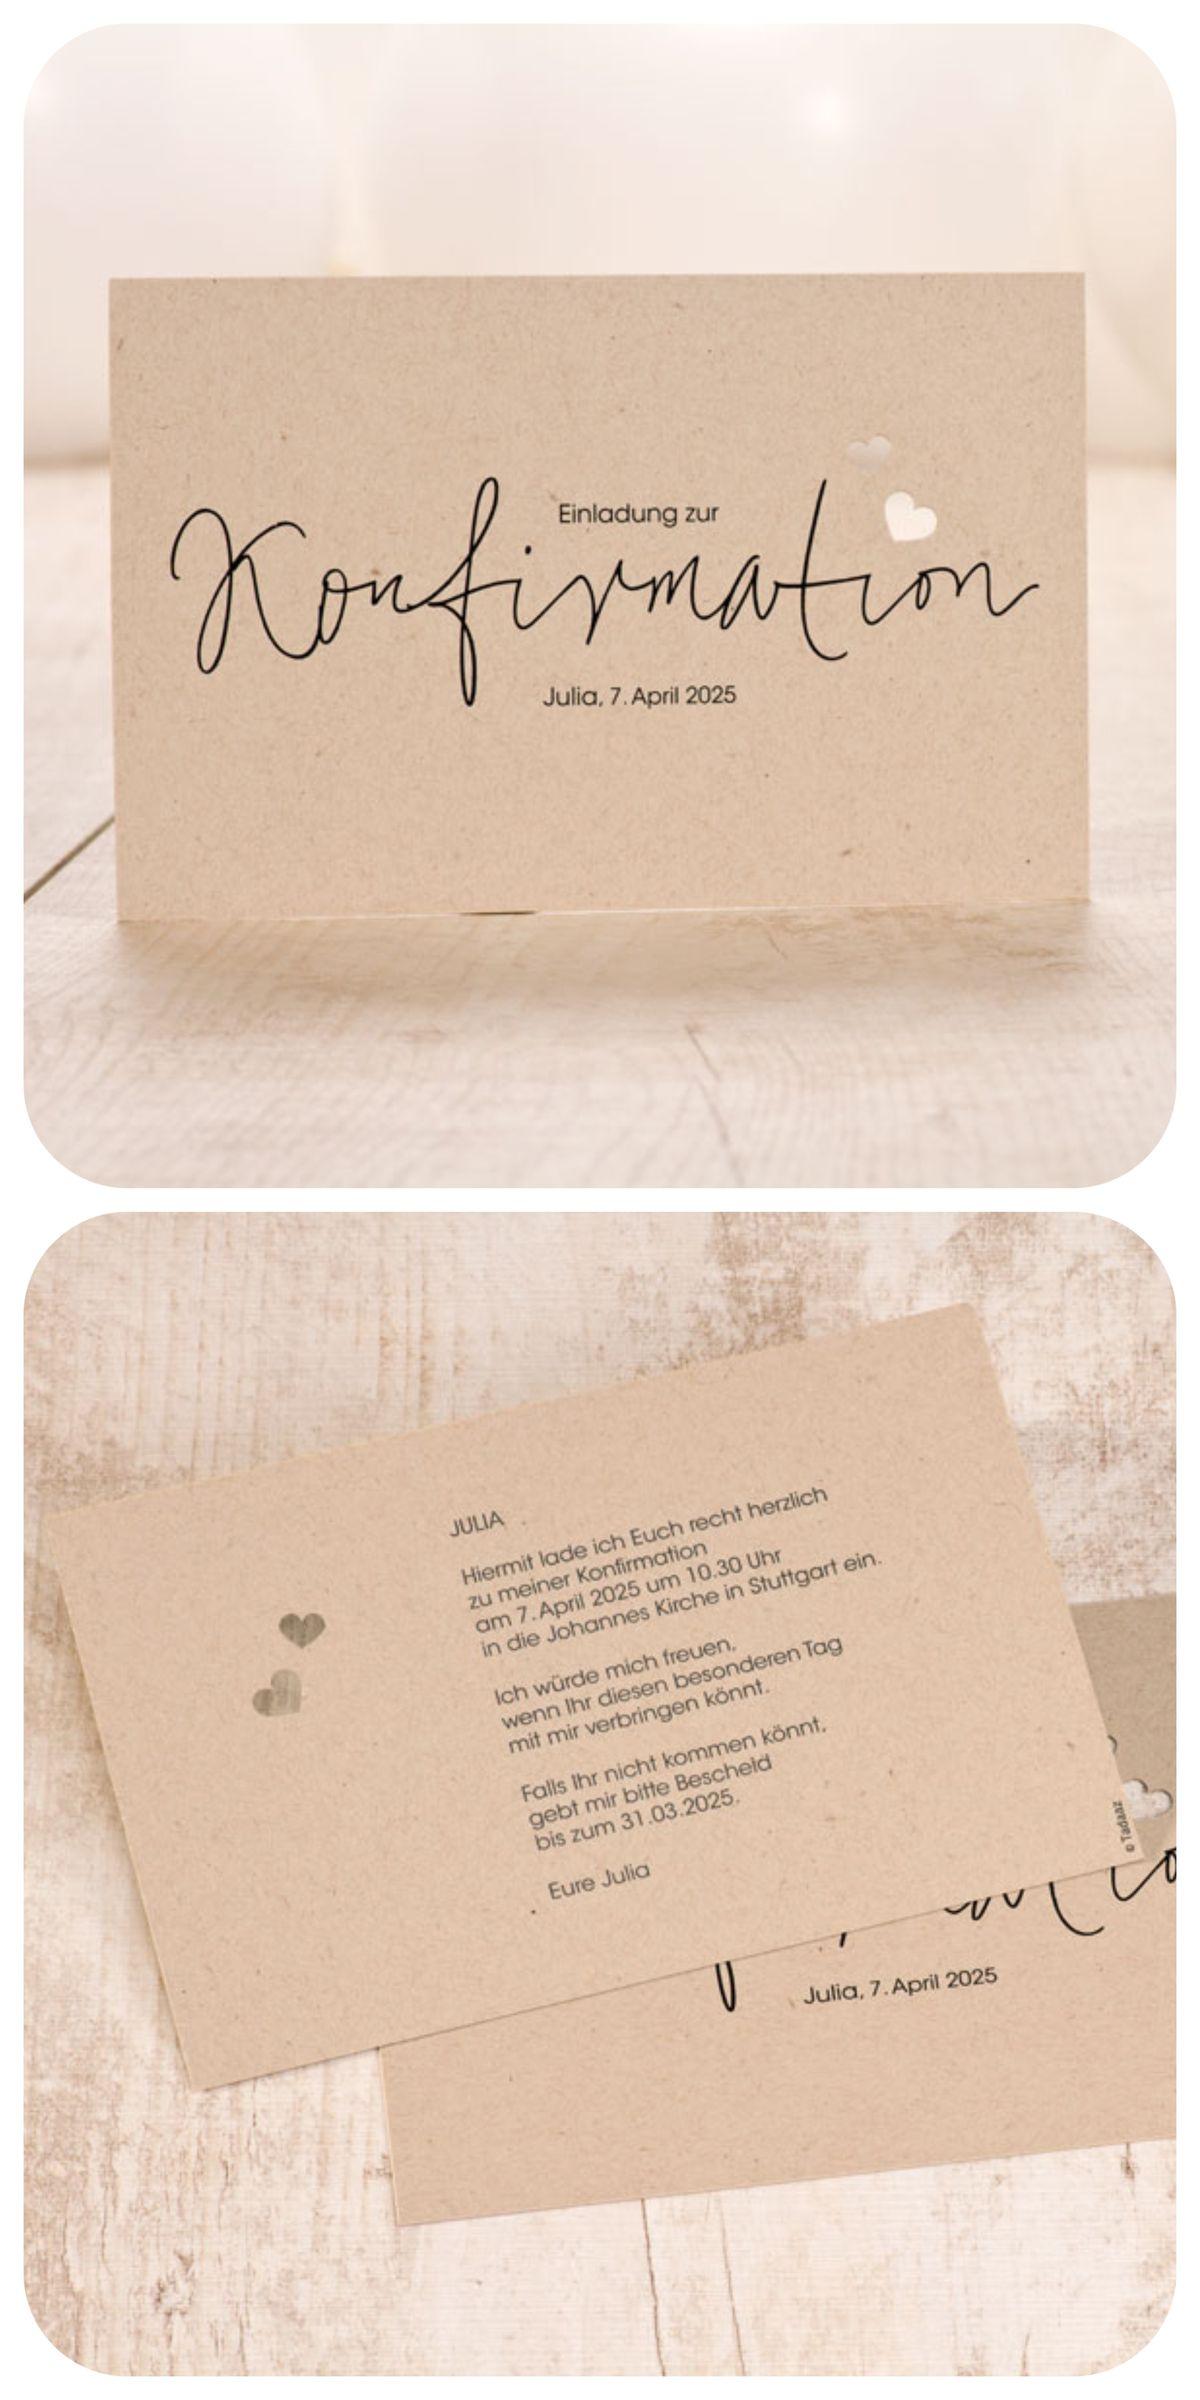 Ihre Konfirmationskarte in Kraftpapieroptik! #Kraftpapier #Konfirmation #Einladung #Lasercut